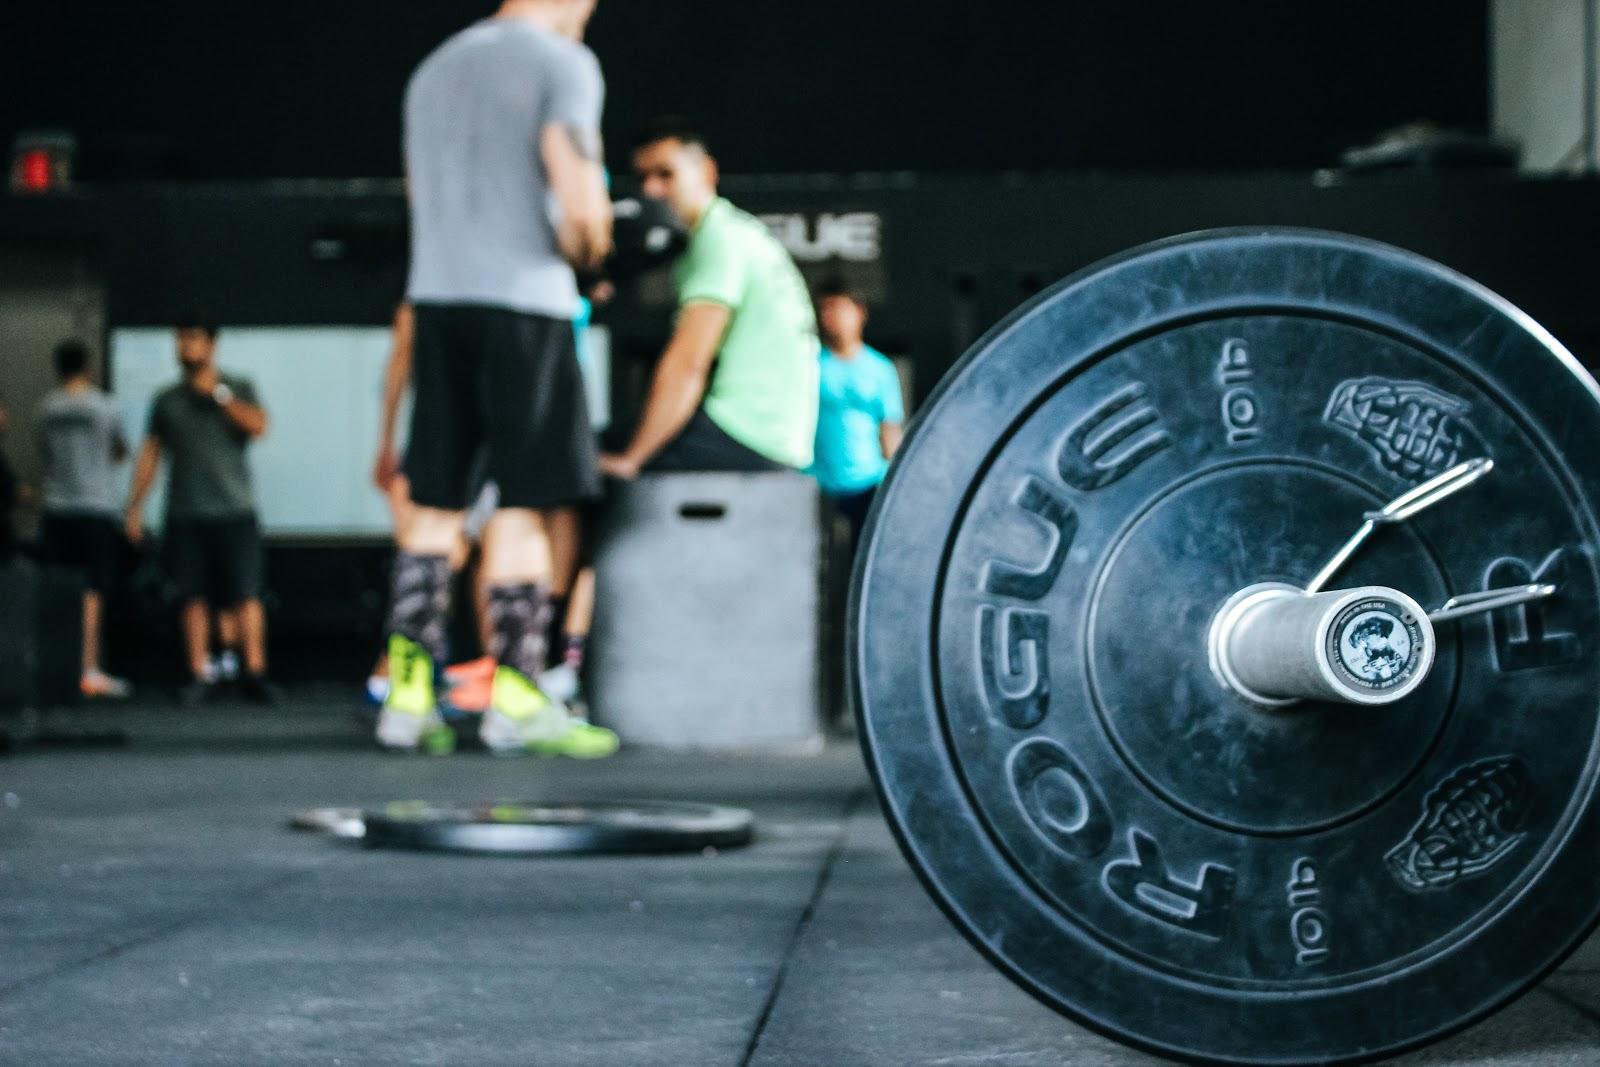 Weight Lifting inside a fitness center